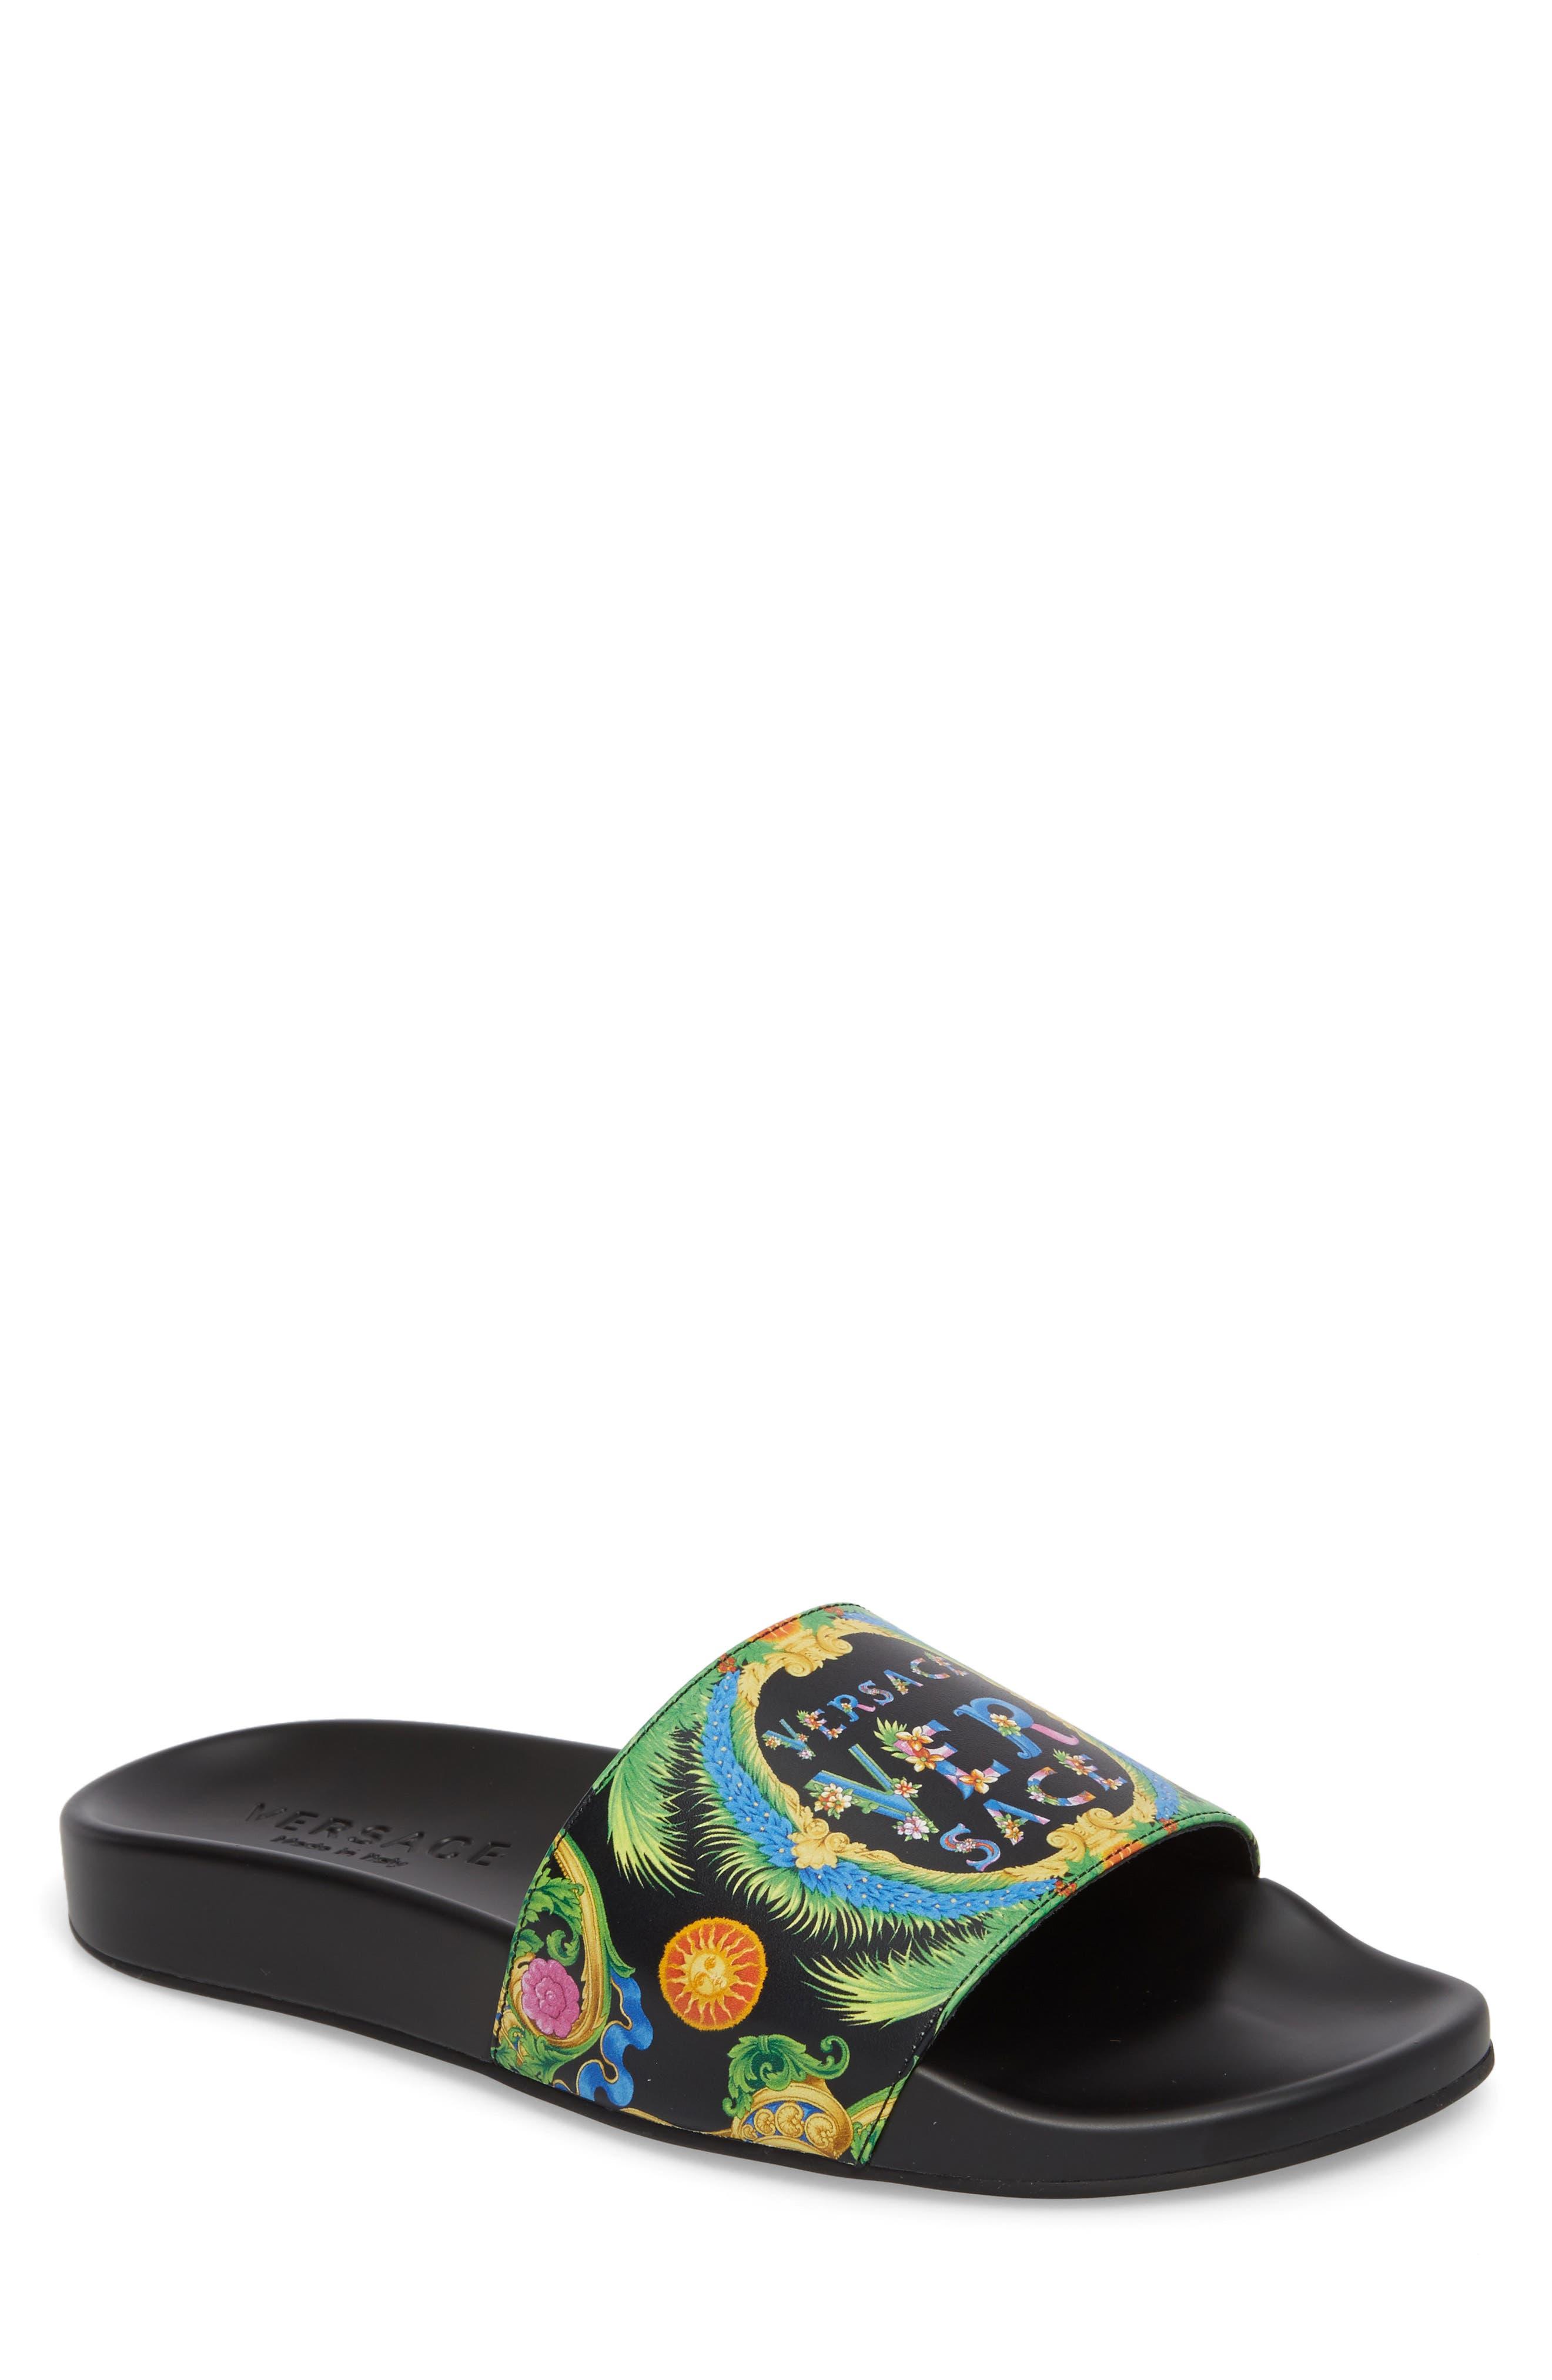 Main Image - Versace First Line Miami Slide Sandal (Men)